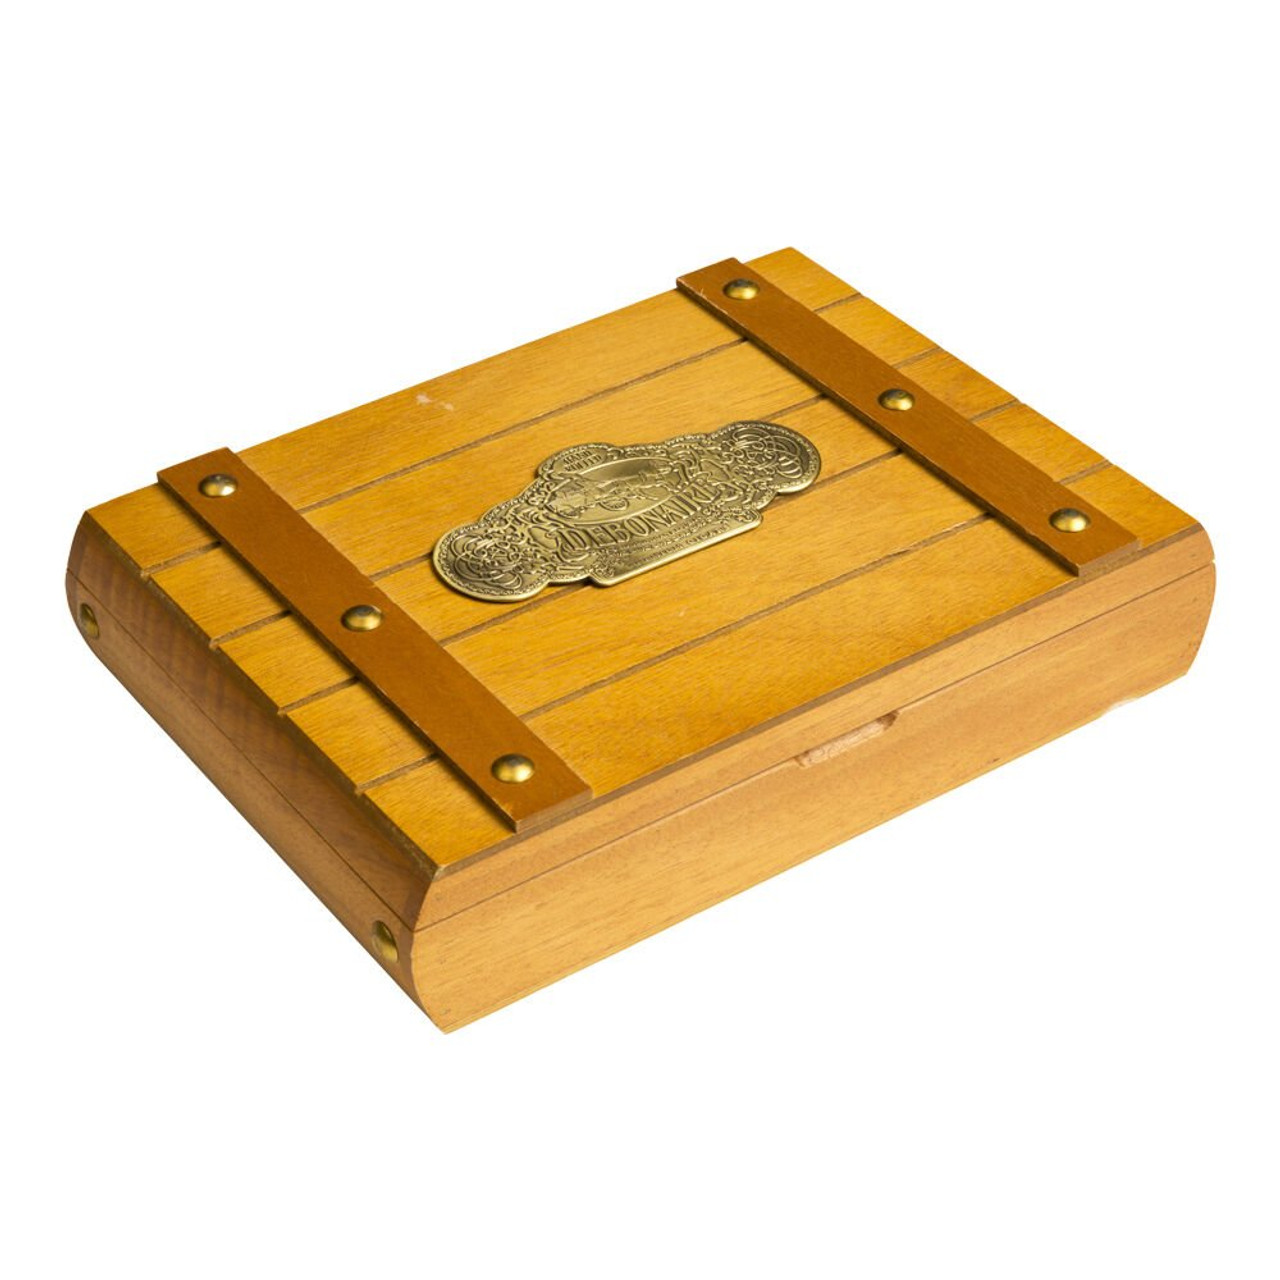 Debonaire Daybreak First Degree Cigars - 4 x 44 (Box of 20)